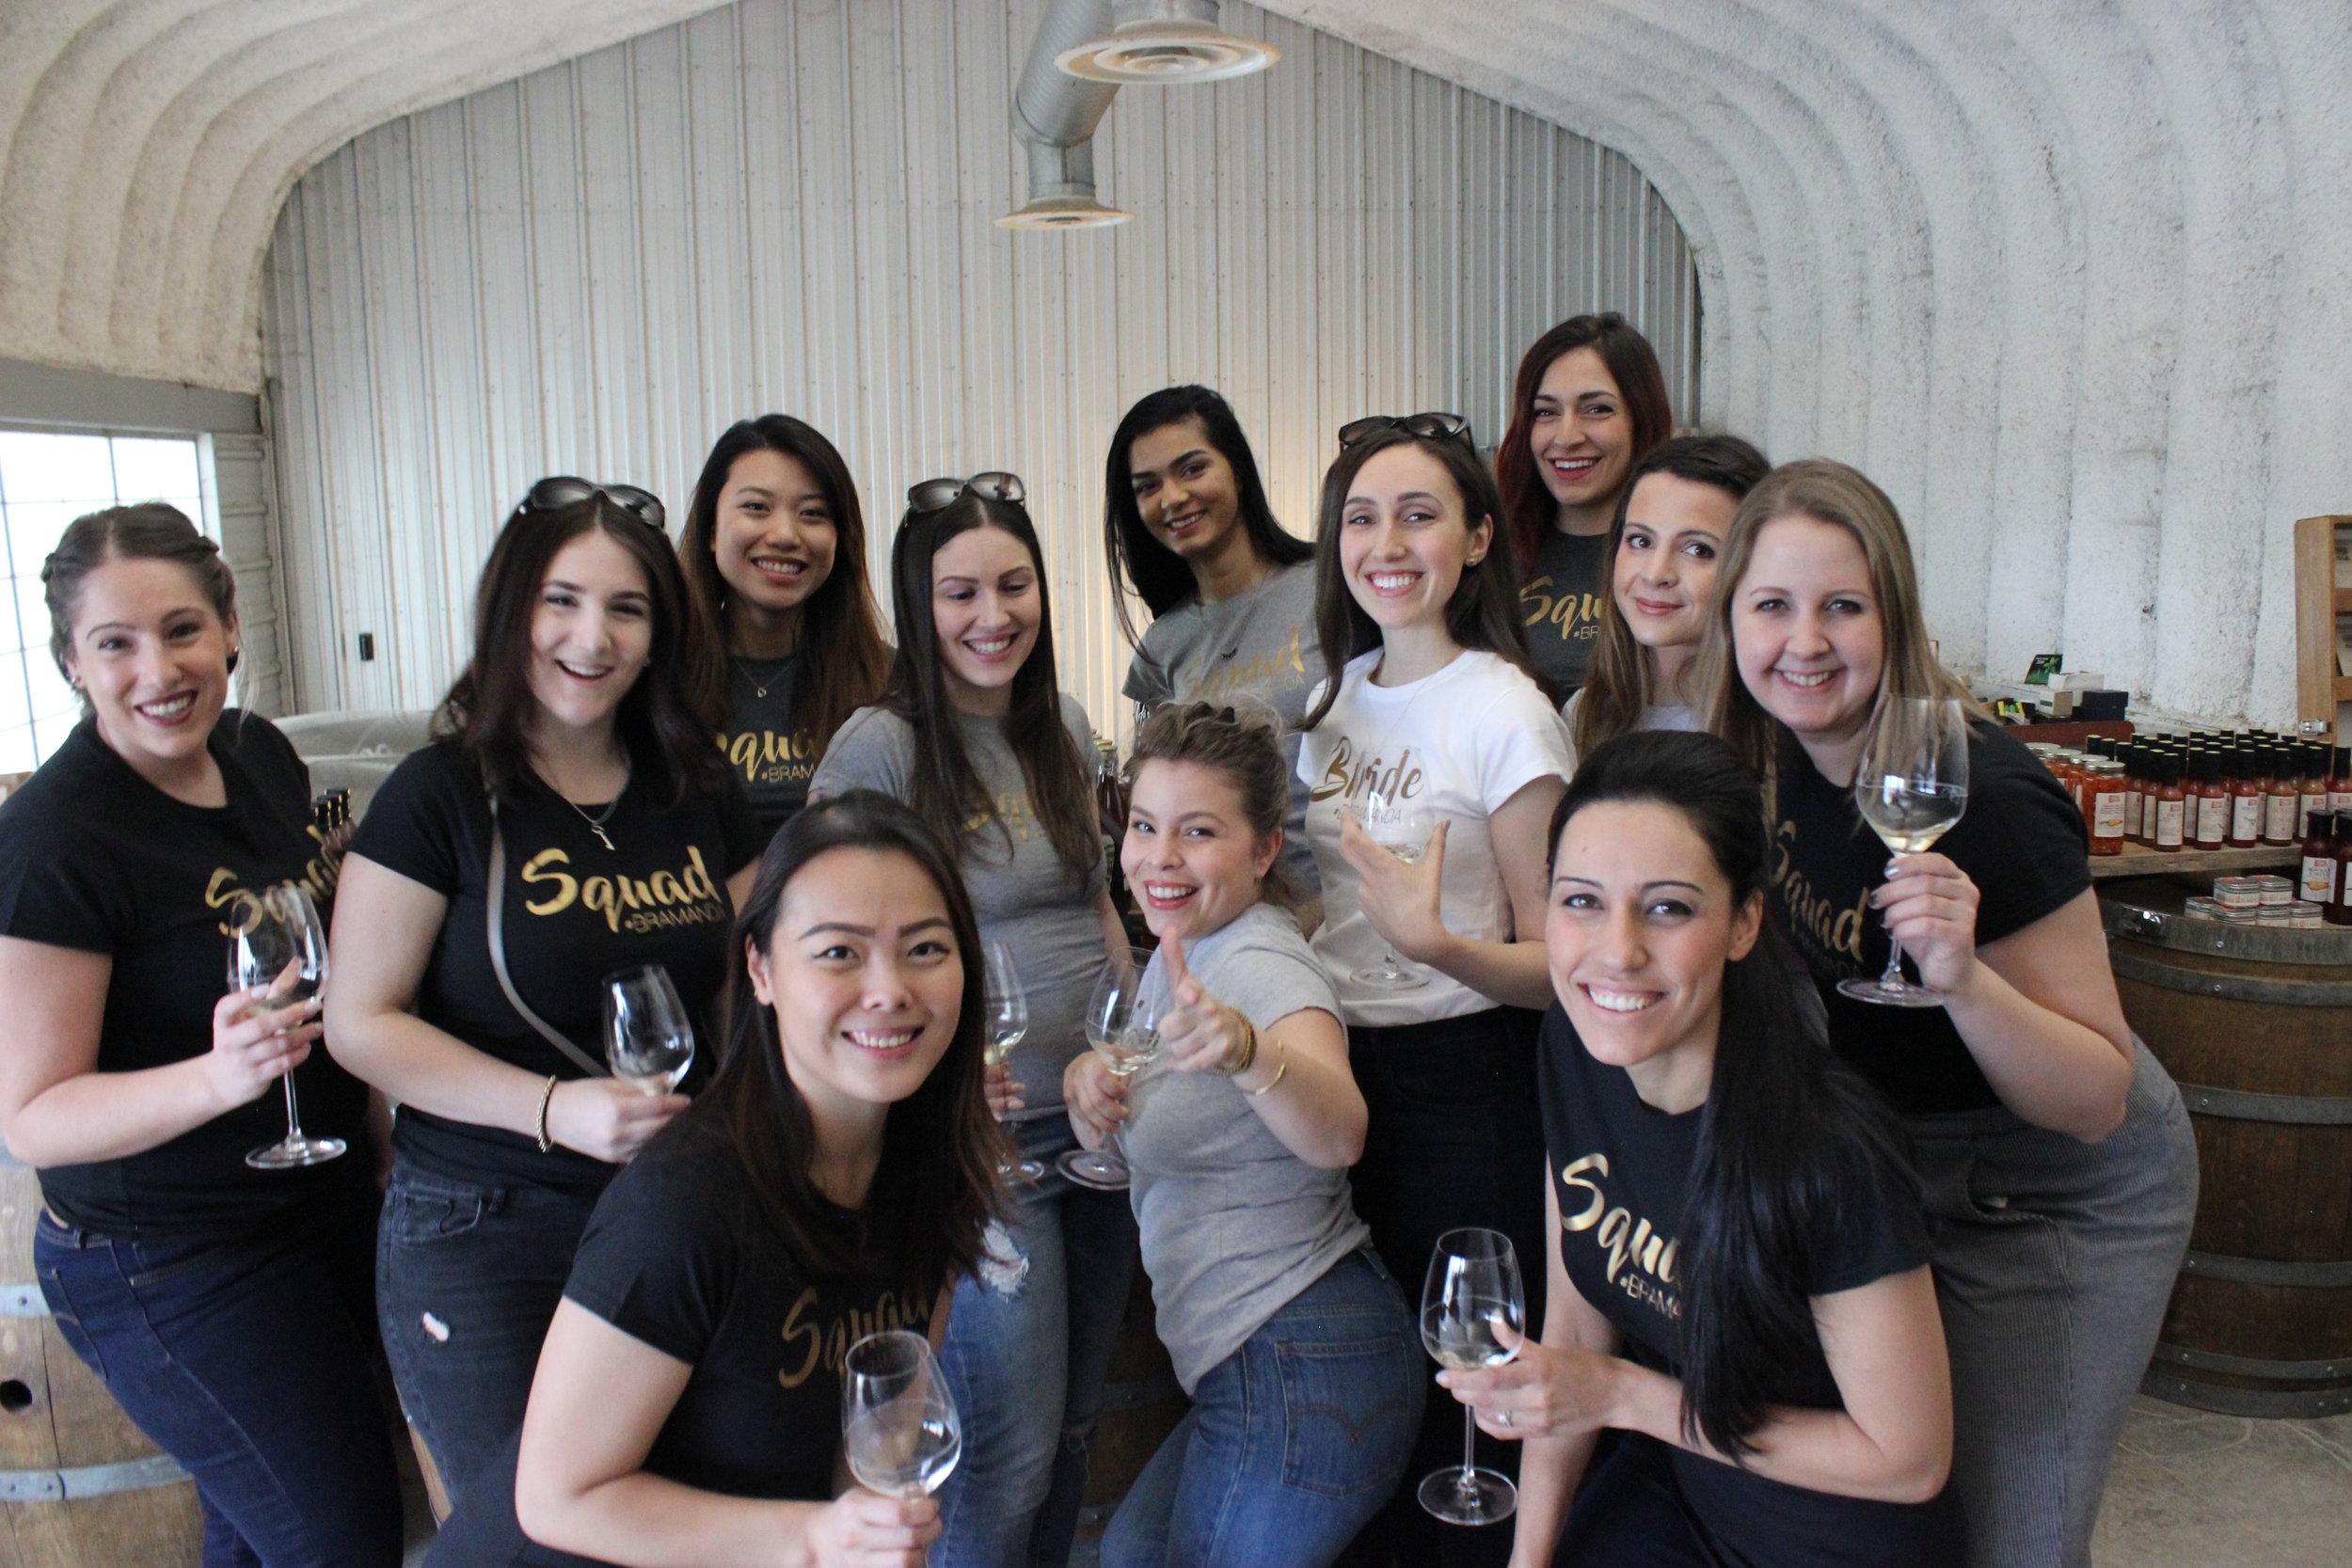 norman hardy winery PEC